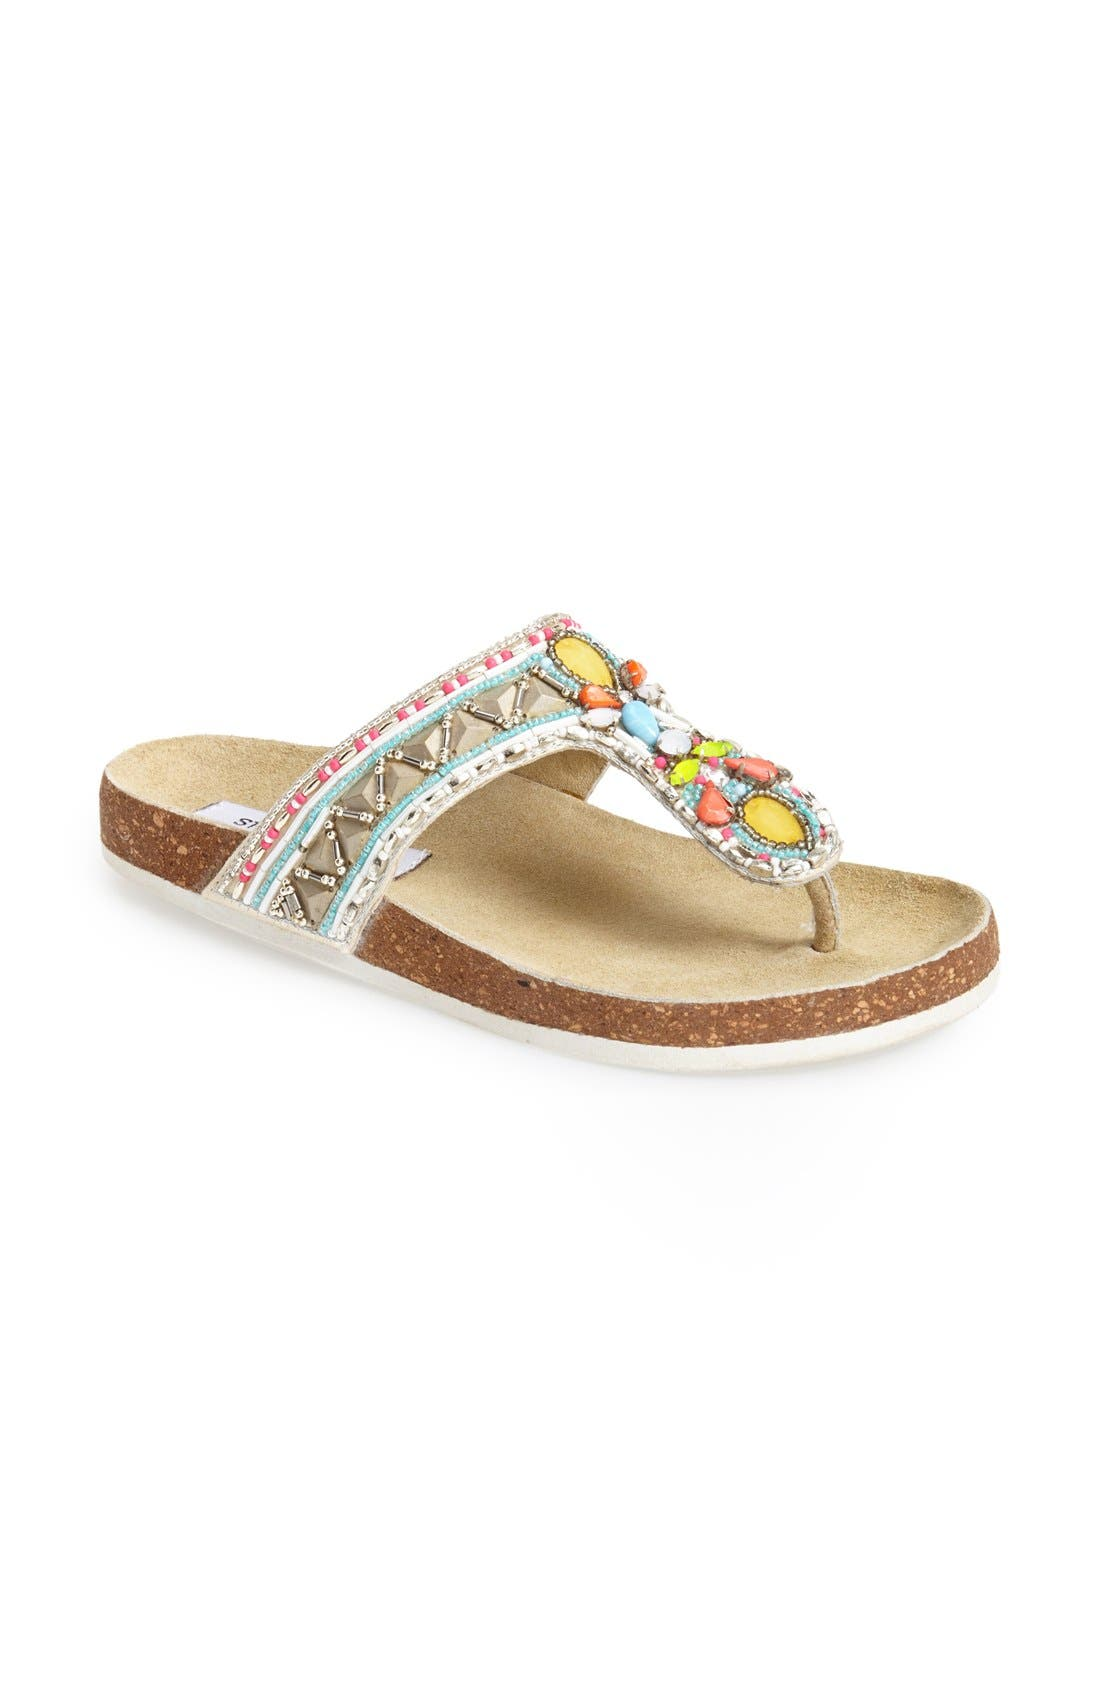 Main Image - Steve Madden 'Fiessta' Embellished Thong Sandal (Women)